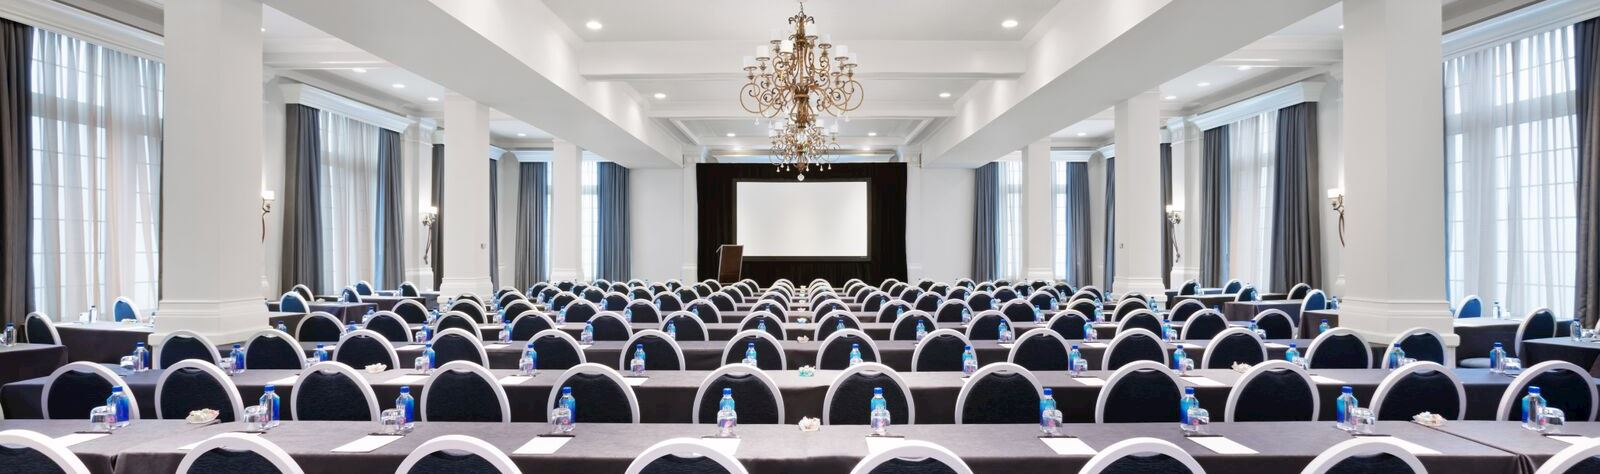 Business Meetings in Florida Hotel